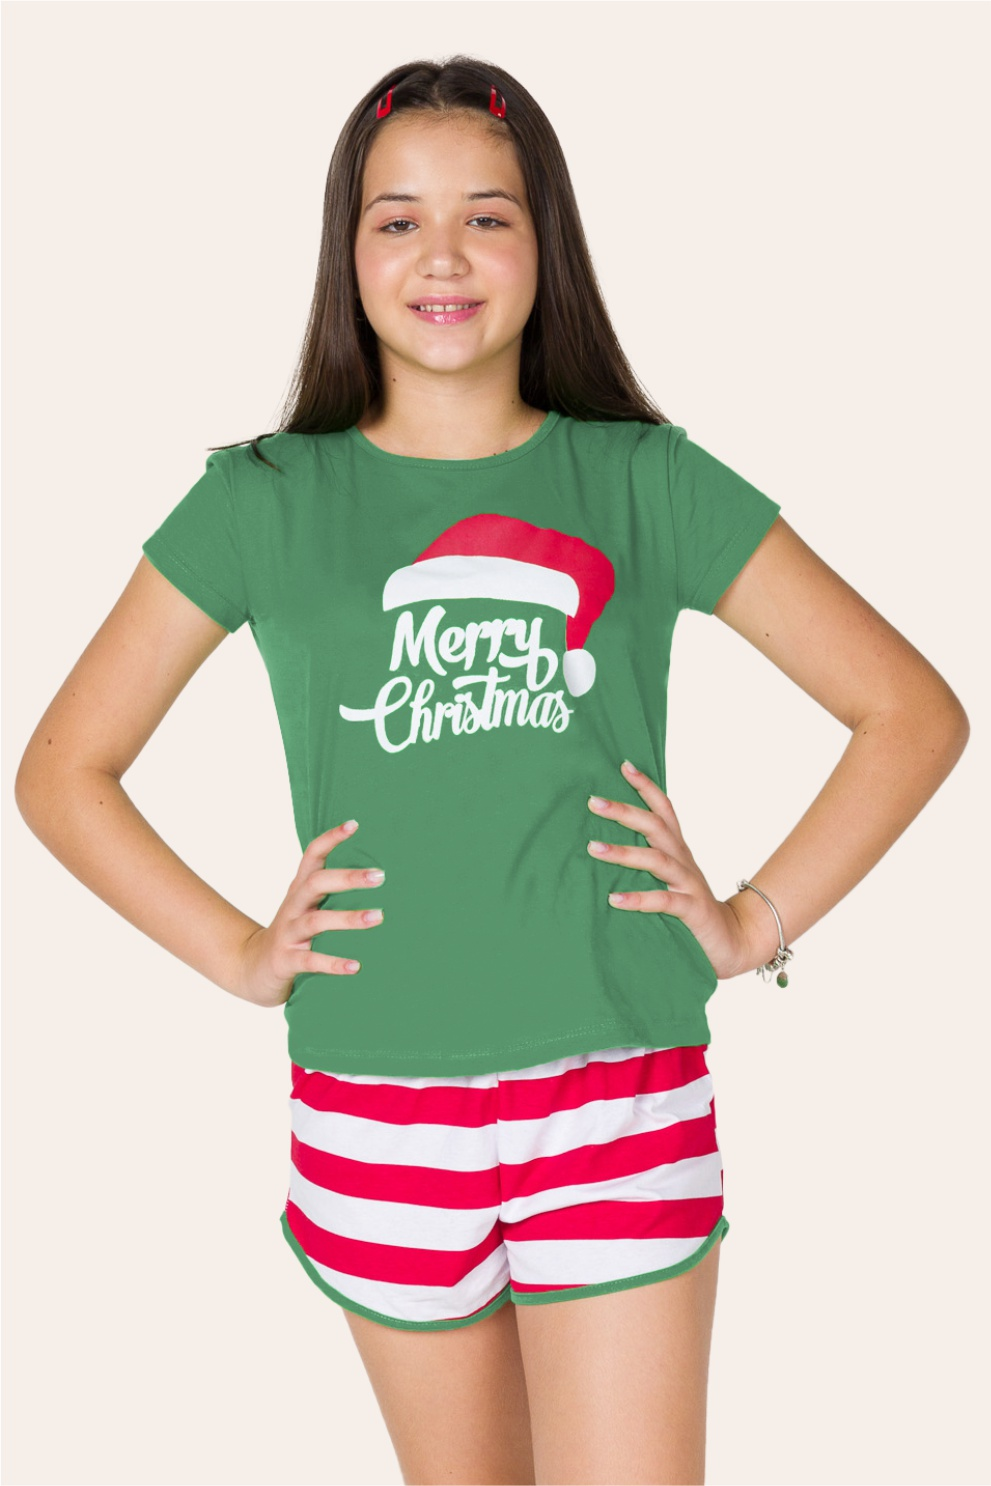 047/B - Pijama de Natal Para Família Merry Christmas - Juvenil Feminino